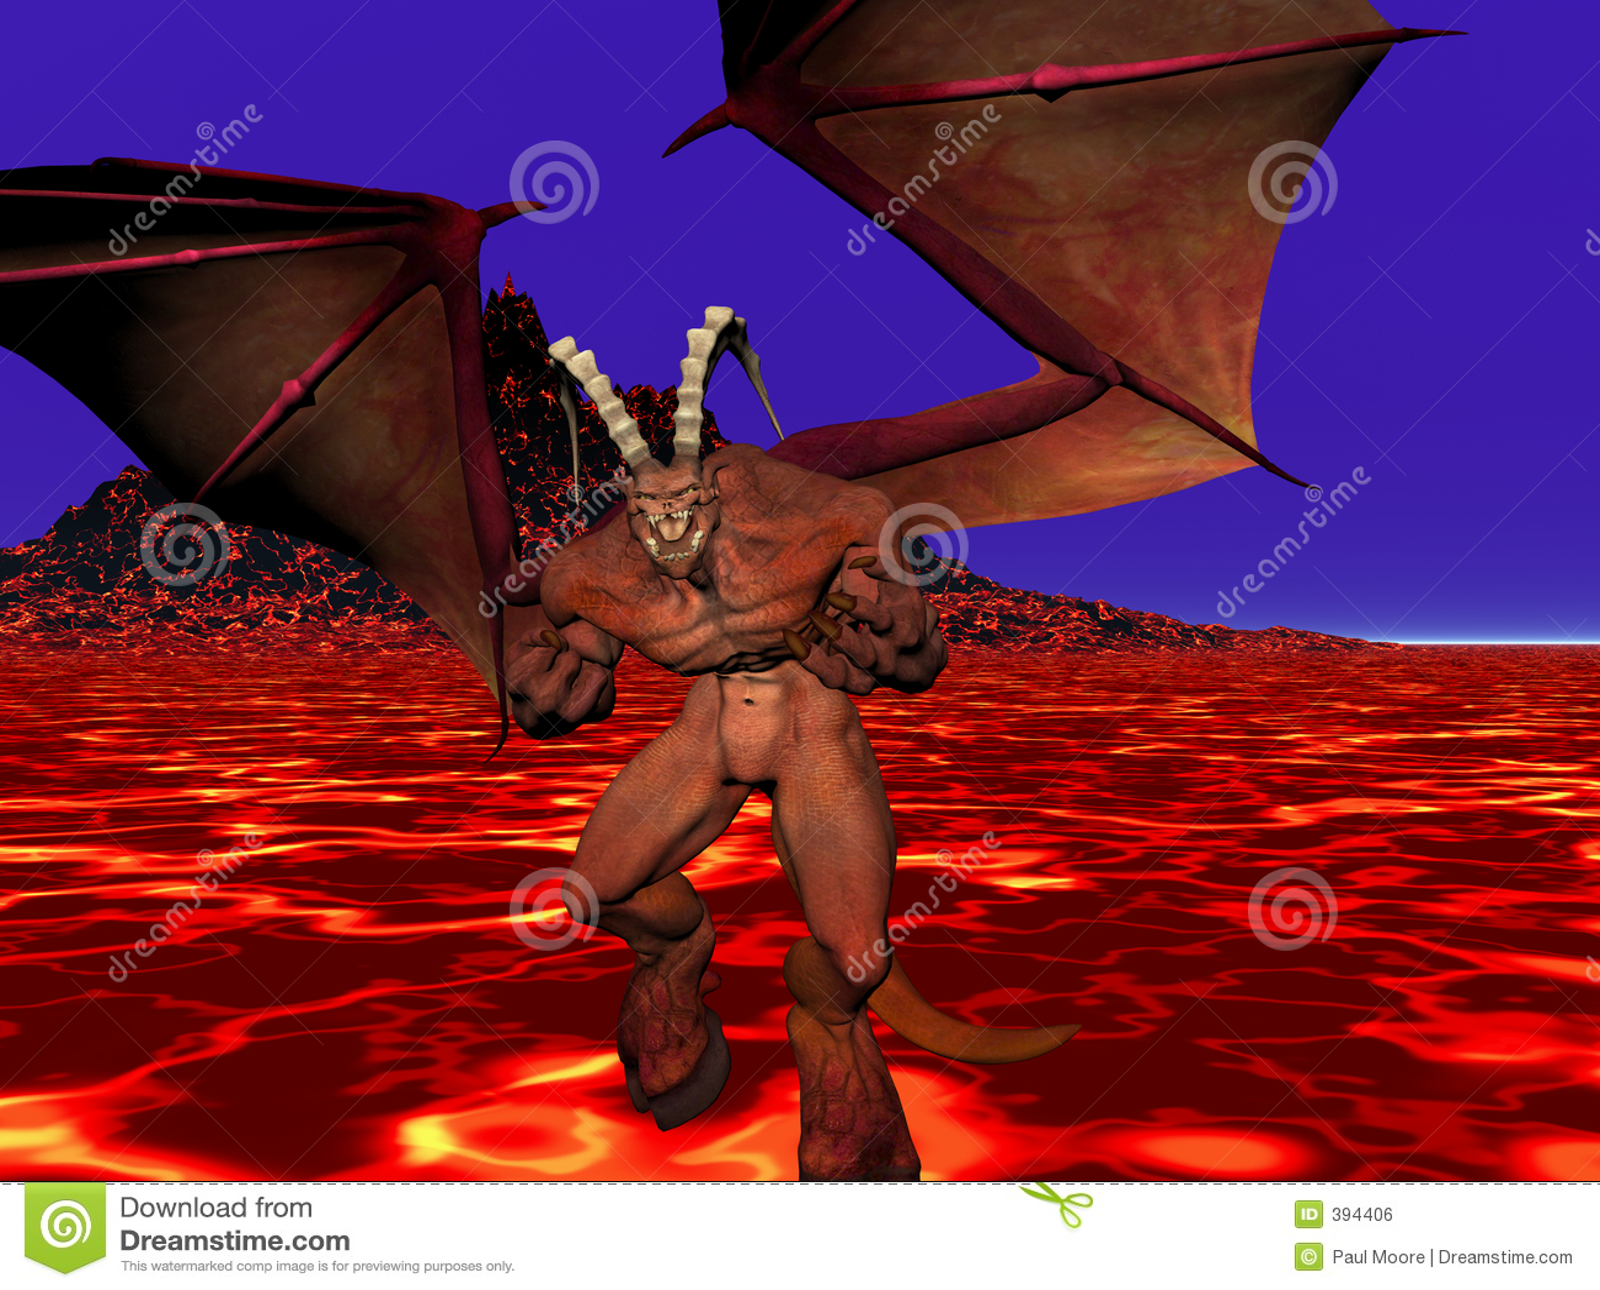 Demon porncraft nude image